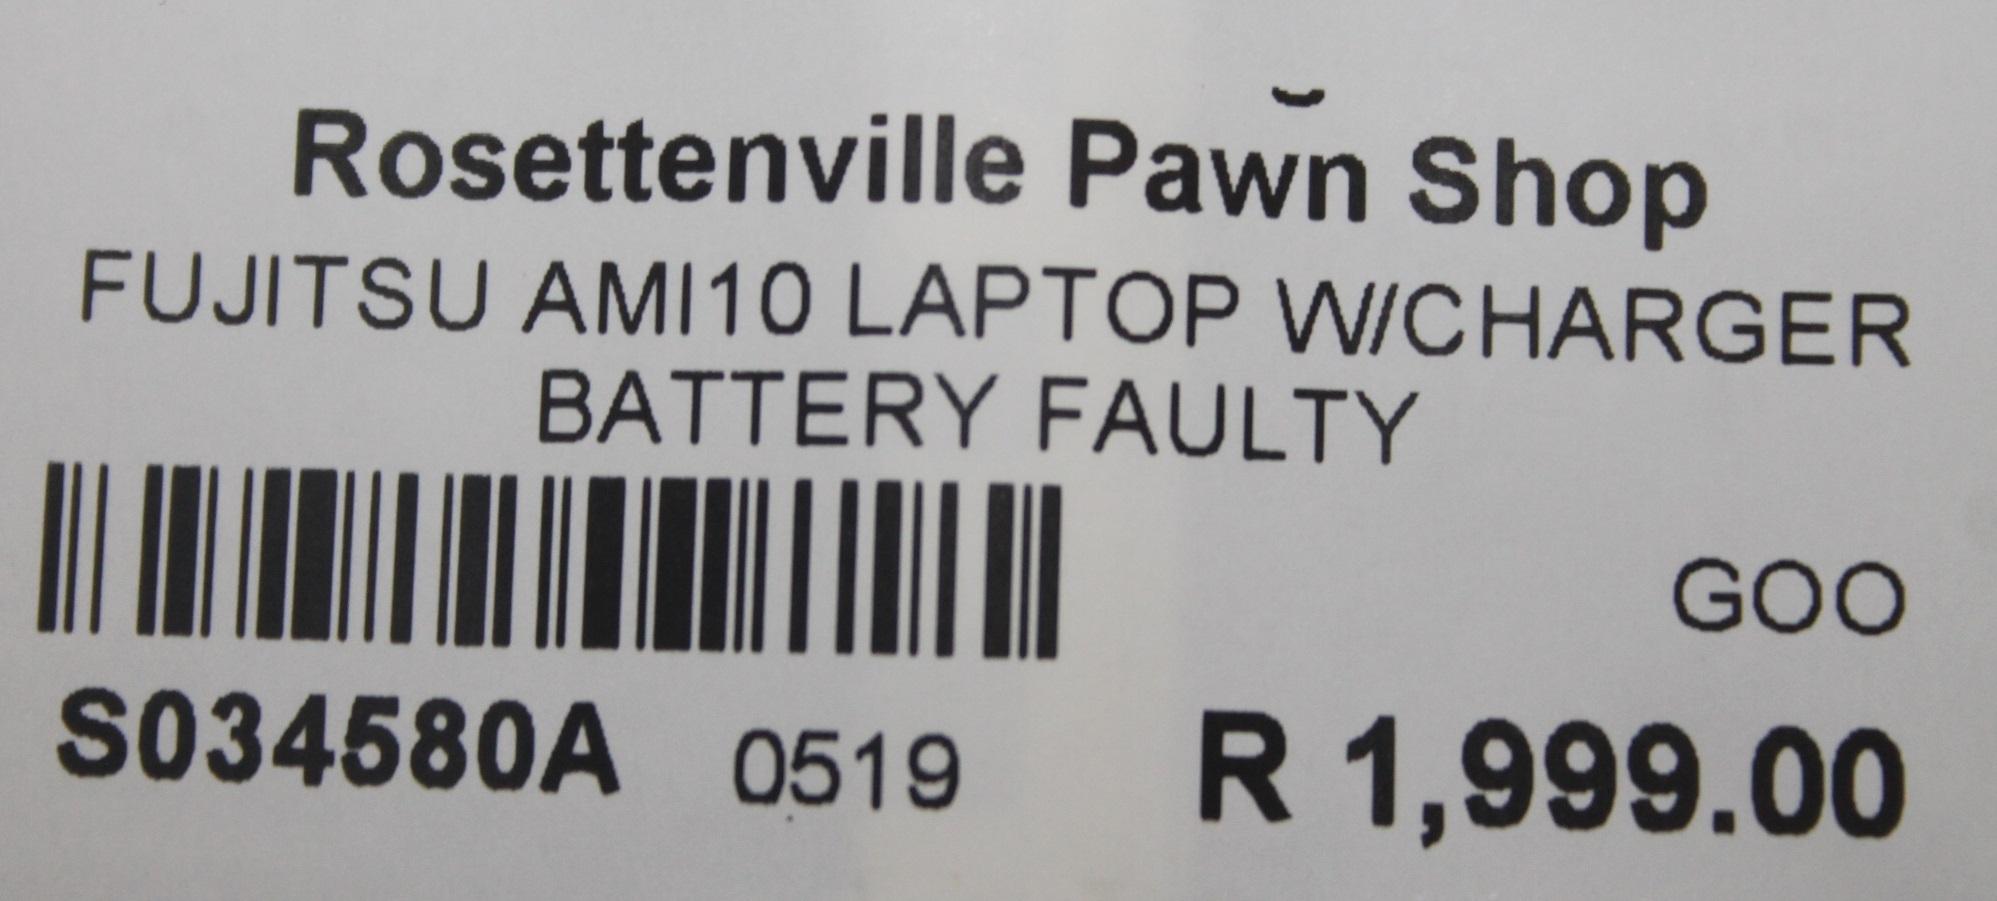 S034580A Fujitsu amilo laptop with charger #Rosettenvillepawnshop